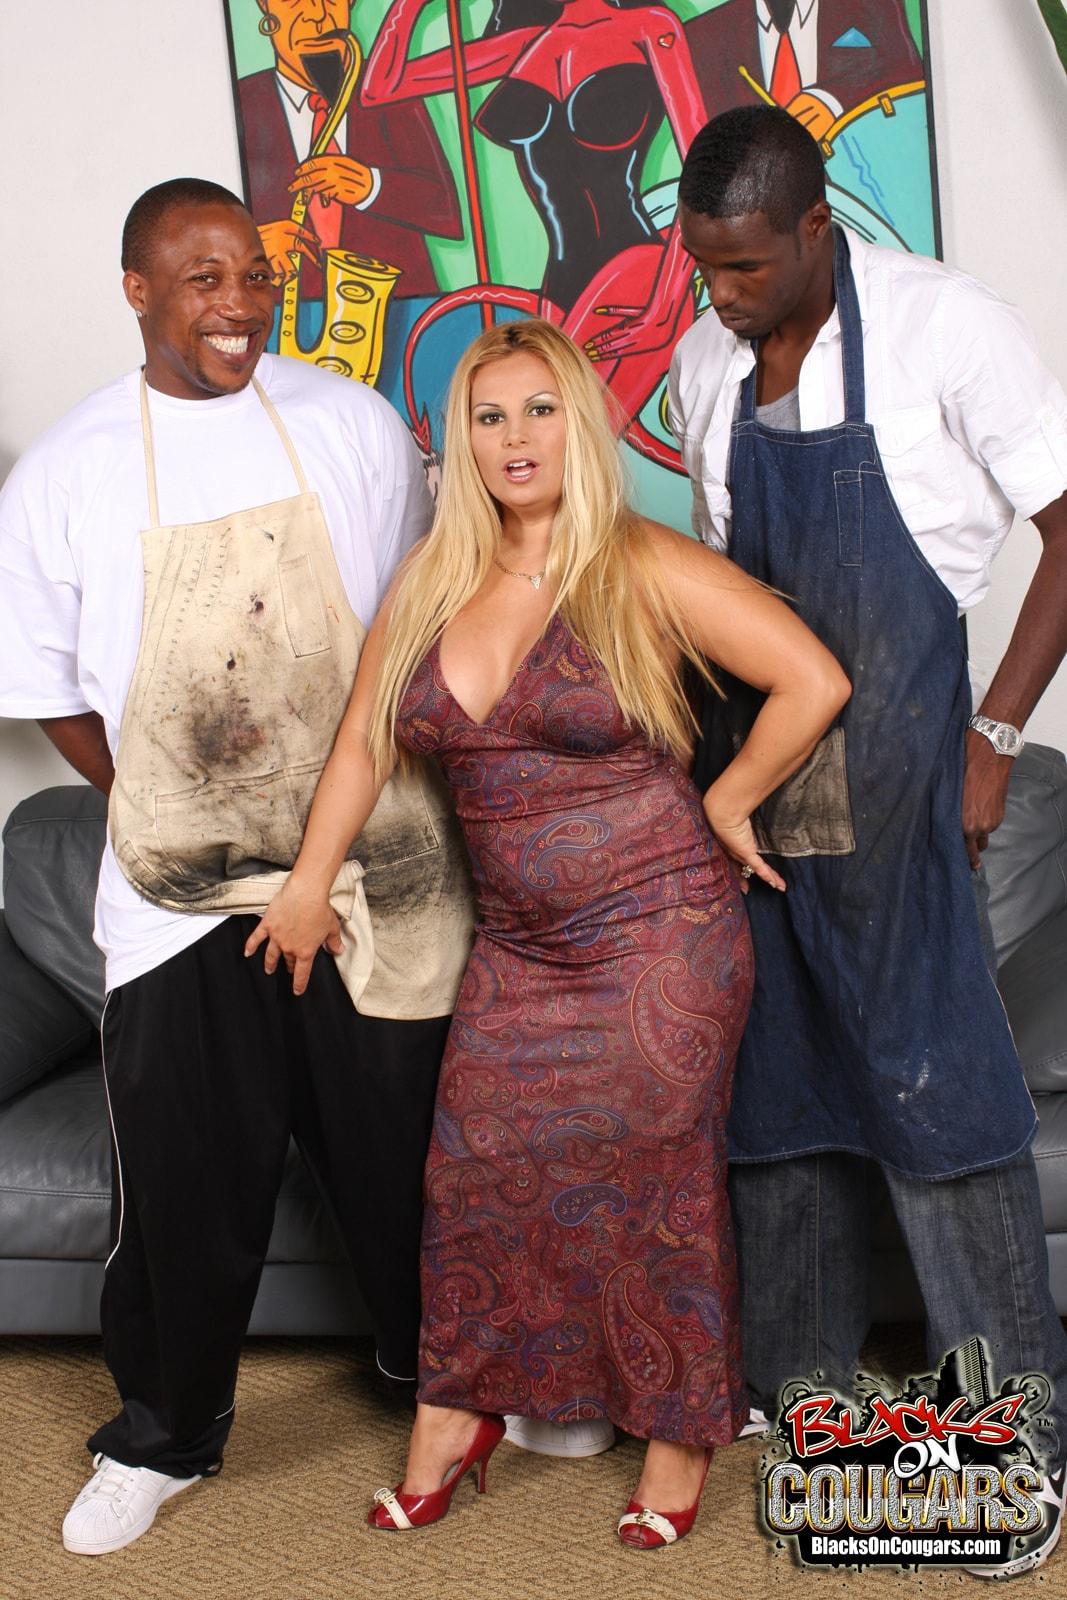 Dogfart '- Blacks On Cougars' starring Friday (Photo 5)